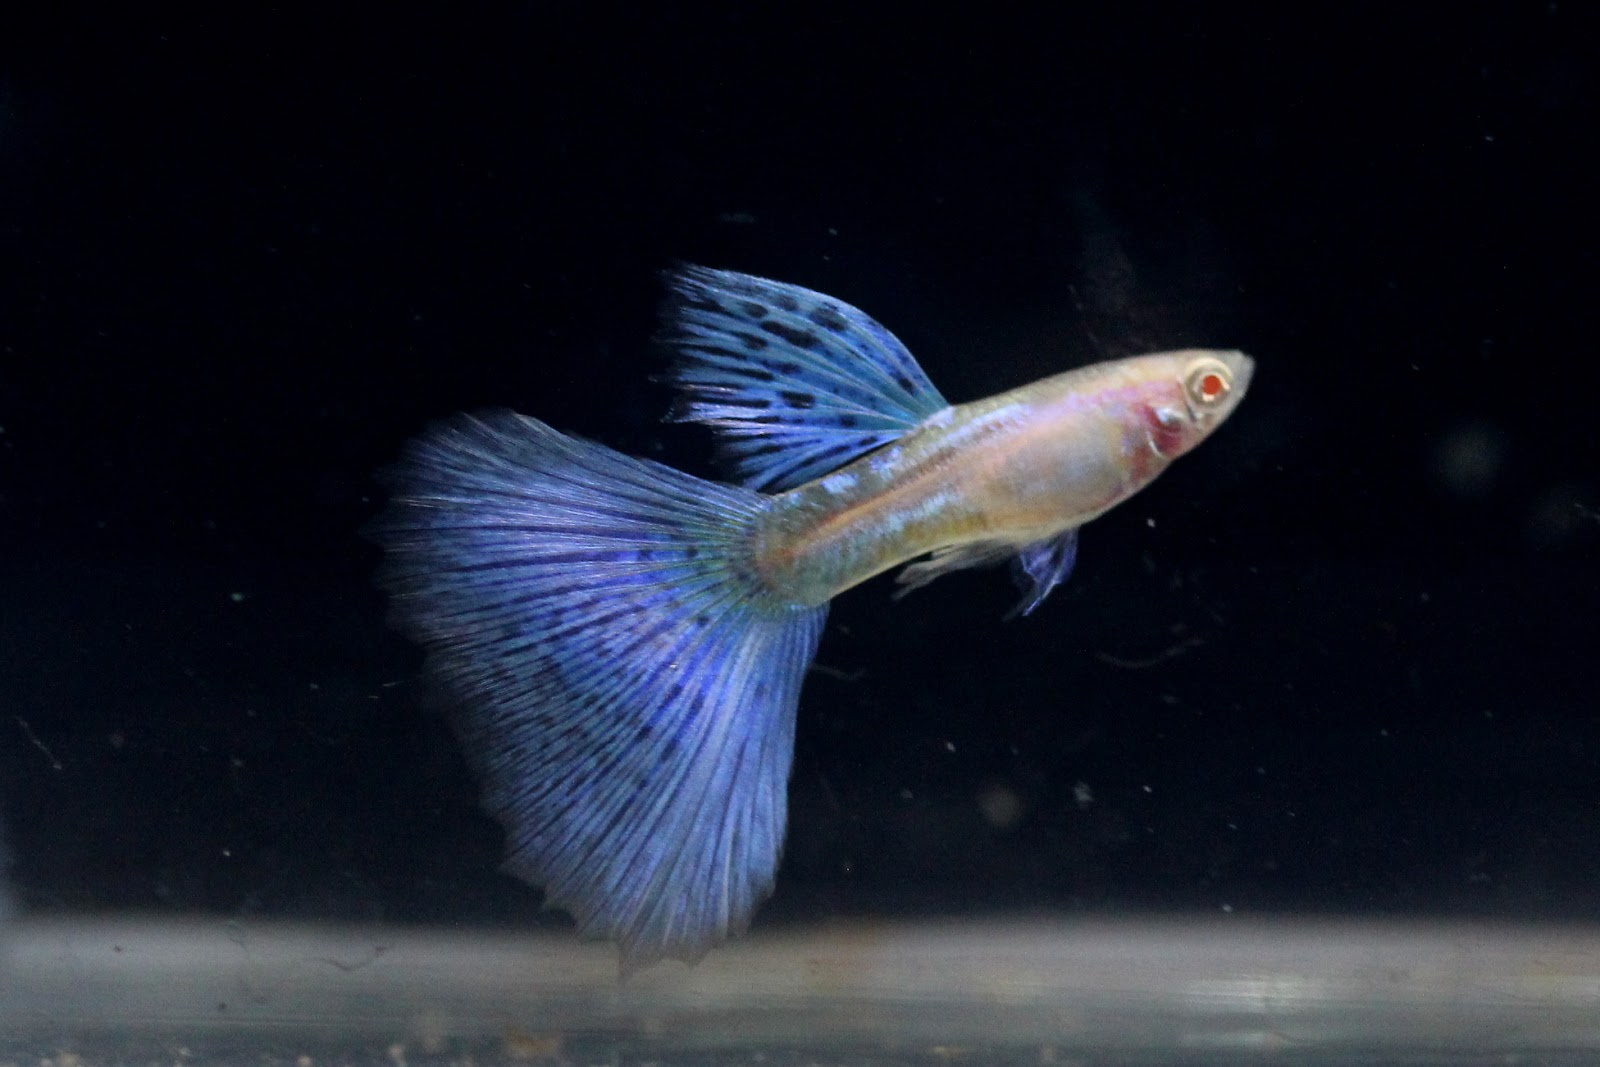 Guppy albino blue grass sale guppy fish indonesia jual guppy albino blue grass harga guppy albino blue grass toko guppy albino blue nvjuhfo Images